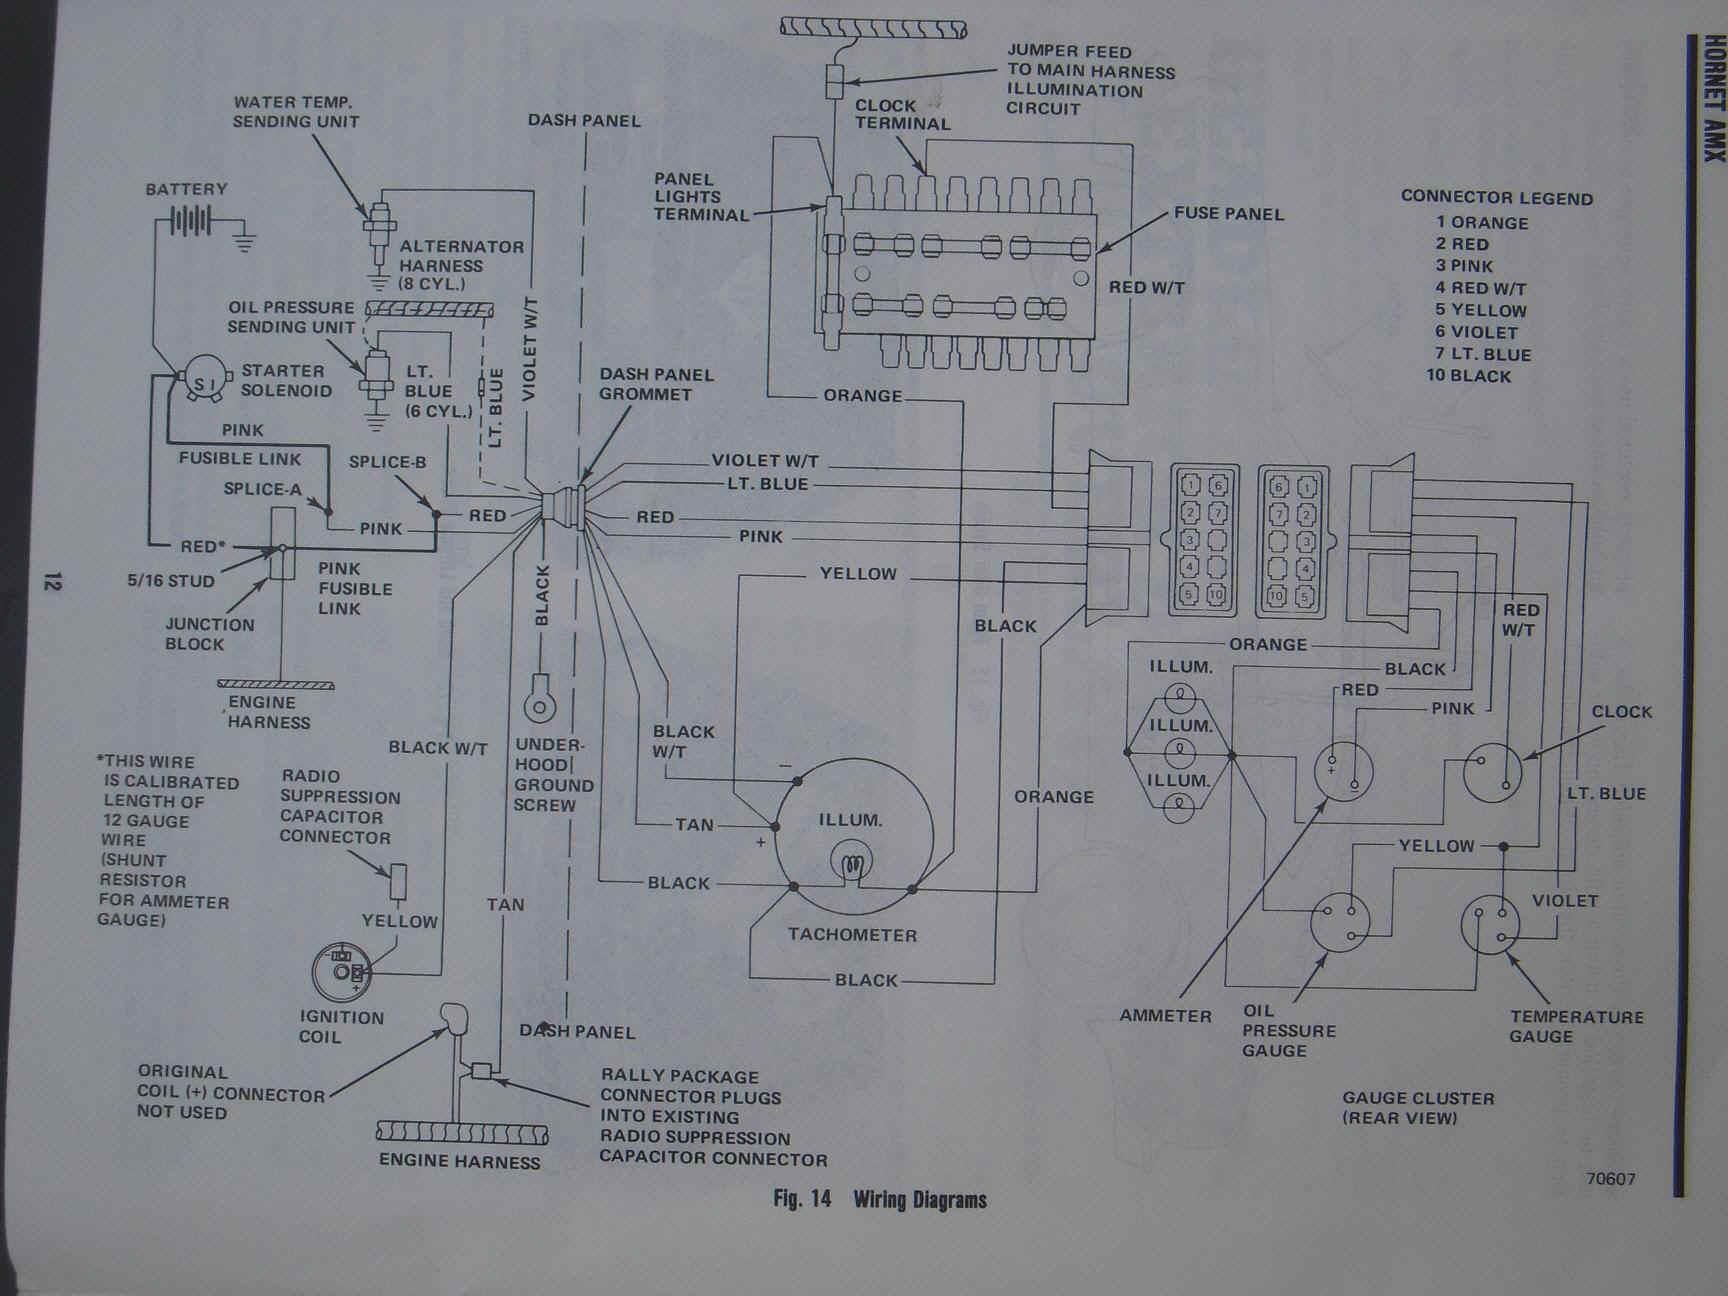 air 2003 fuse honda diagram accord conditiontoning